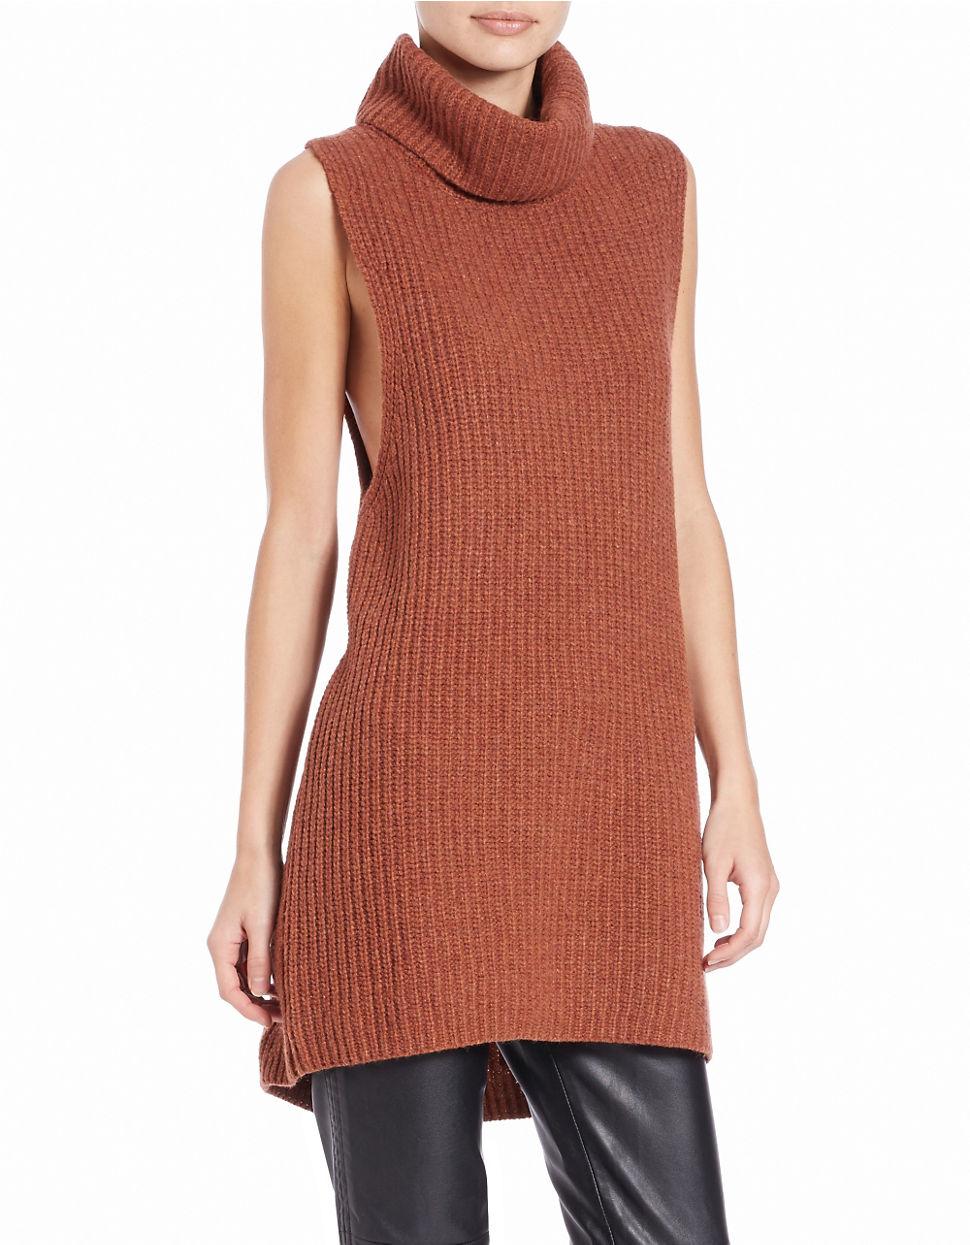 Free people Split-back Sleeveless Sweater in Brown   Lyst